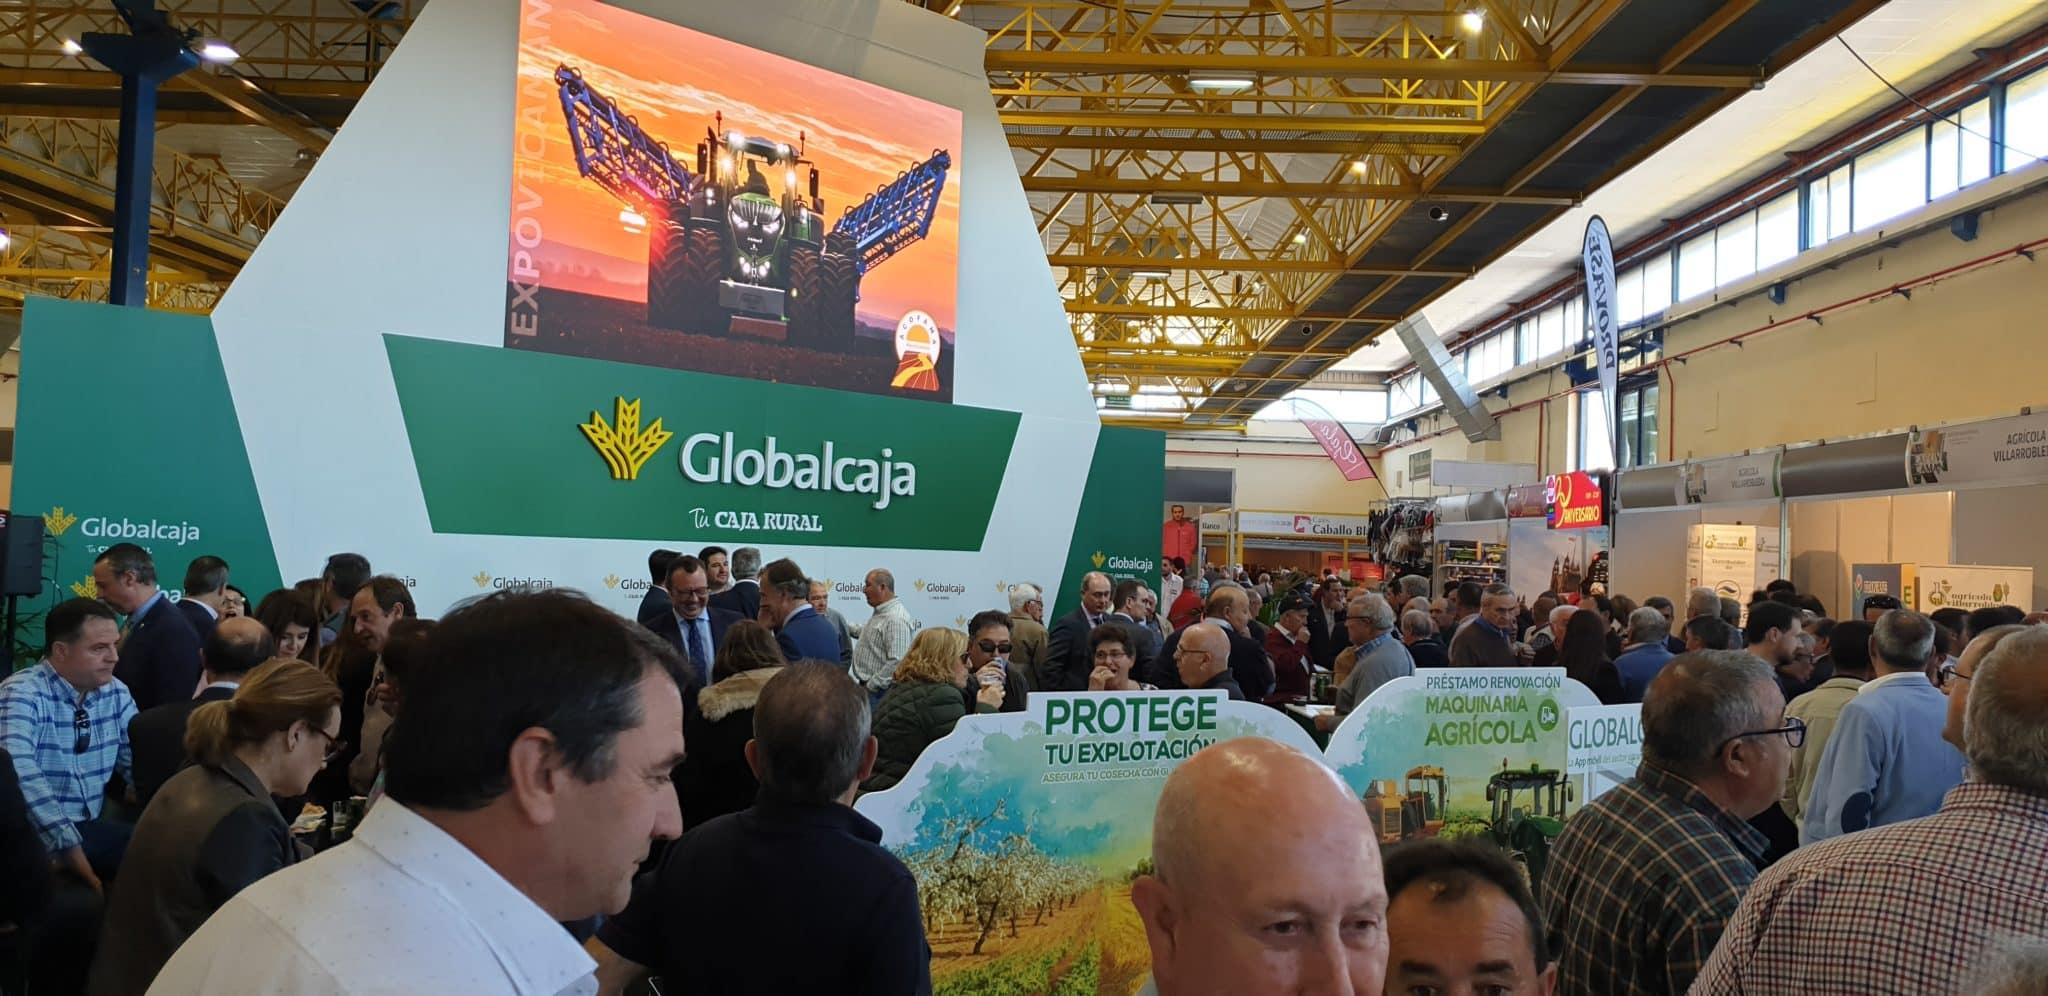 https://blog.globalcaja.es/wp-content/uploads/2019/05/inauguracion-expovicaman.jpg